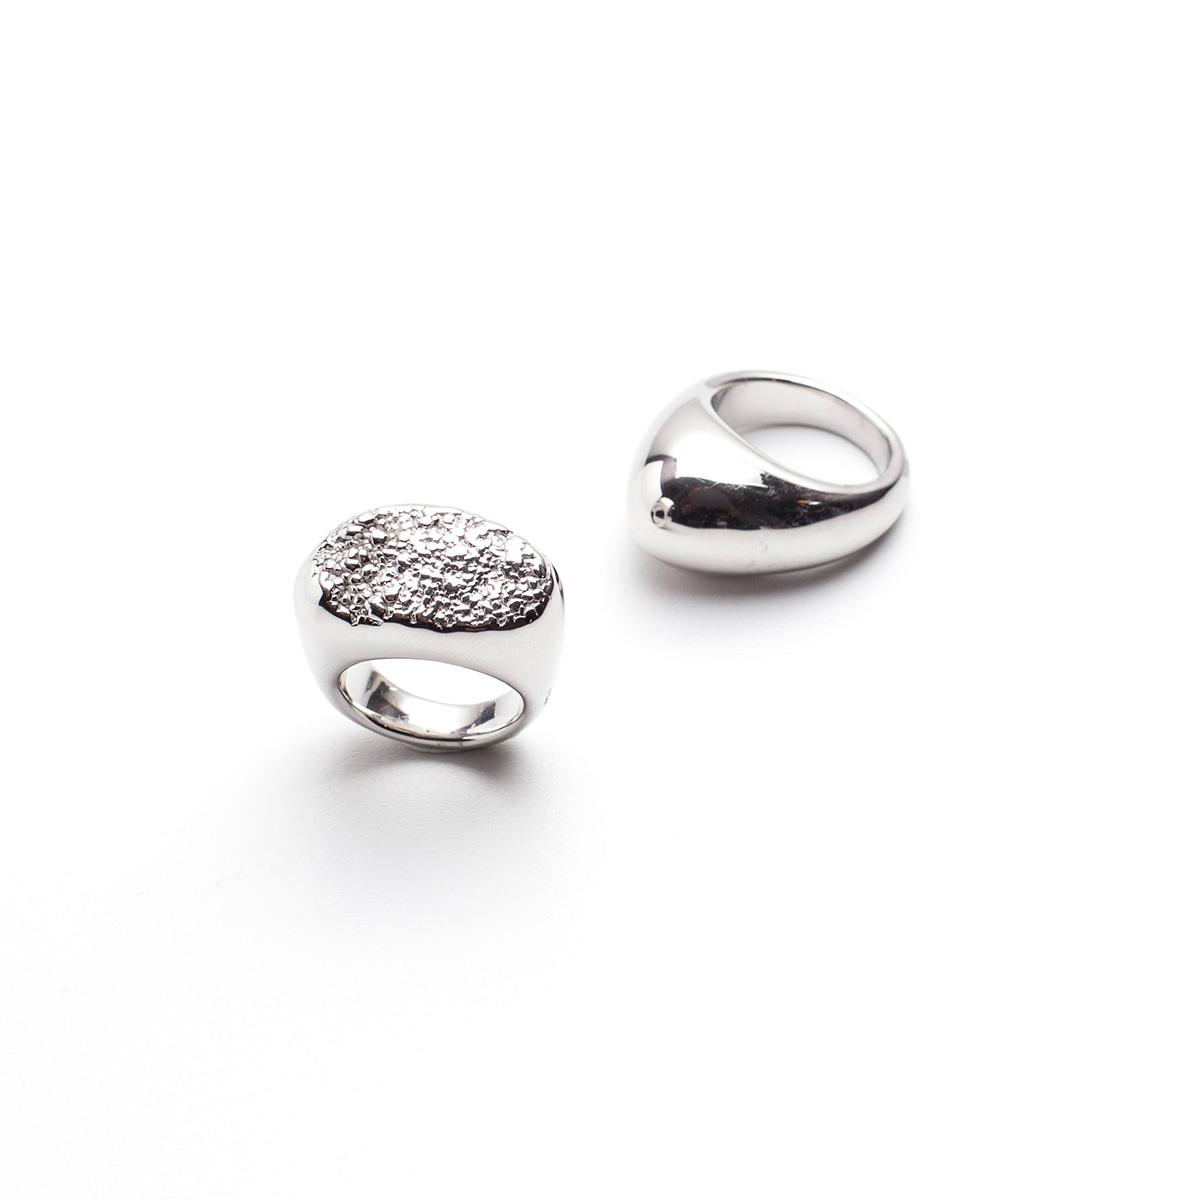 Linea italia silver earring italian collection in silver